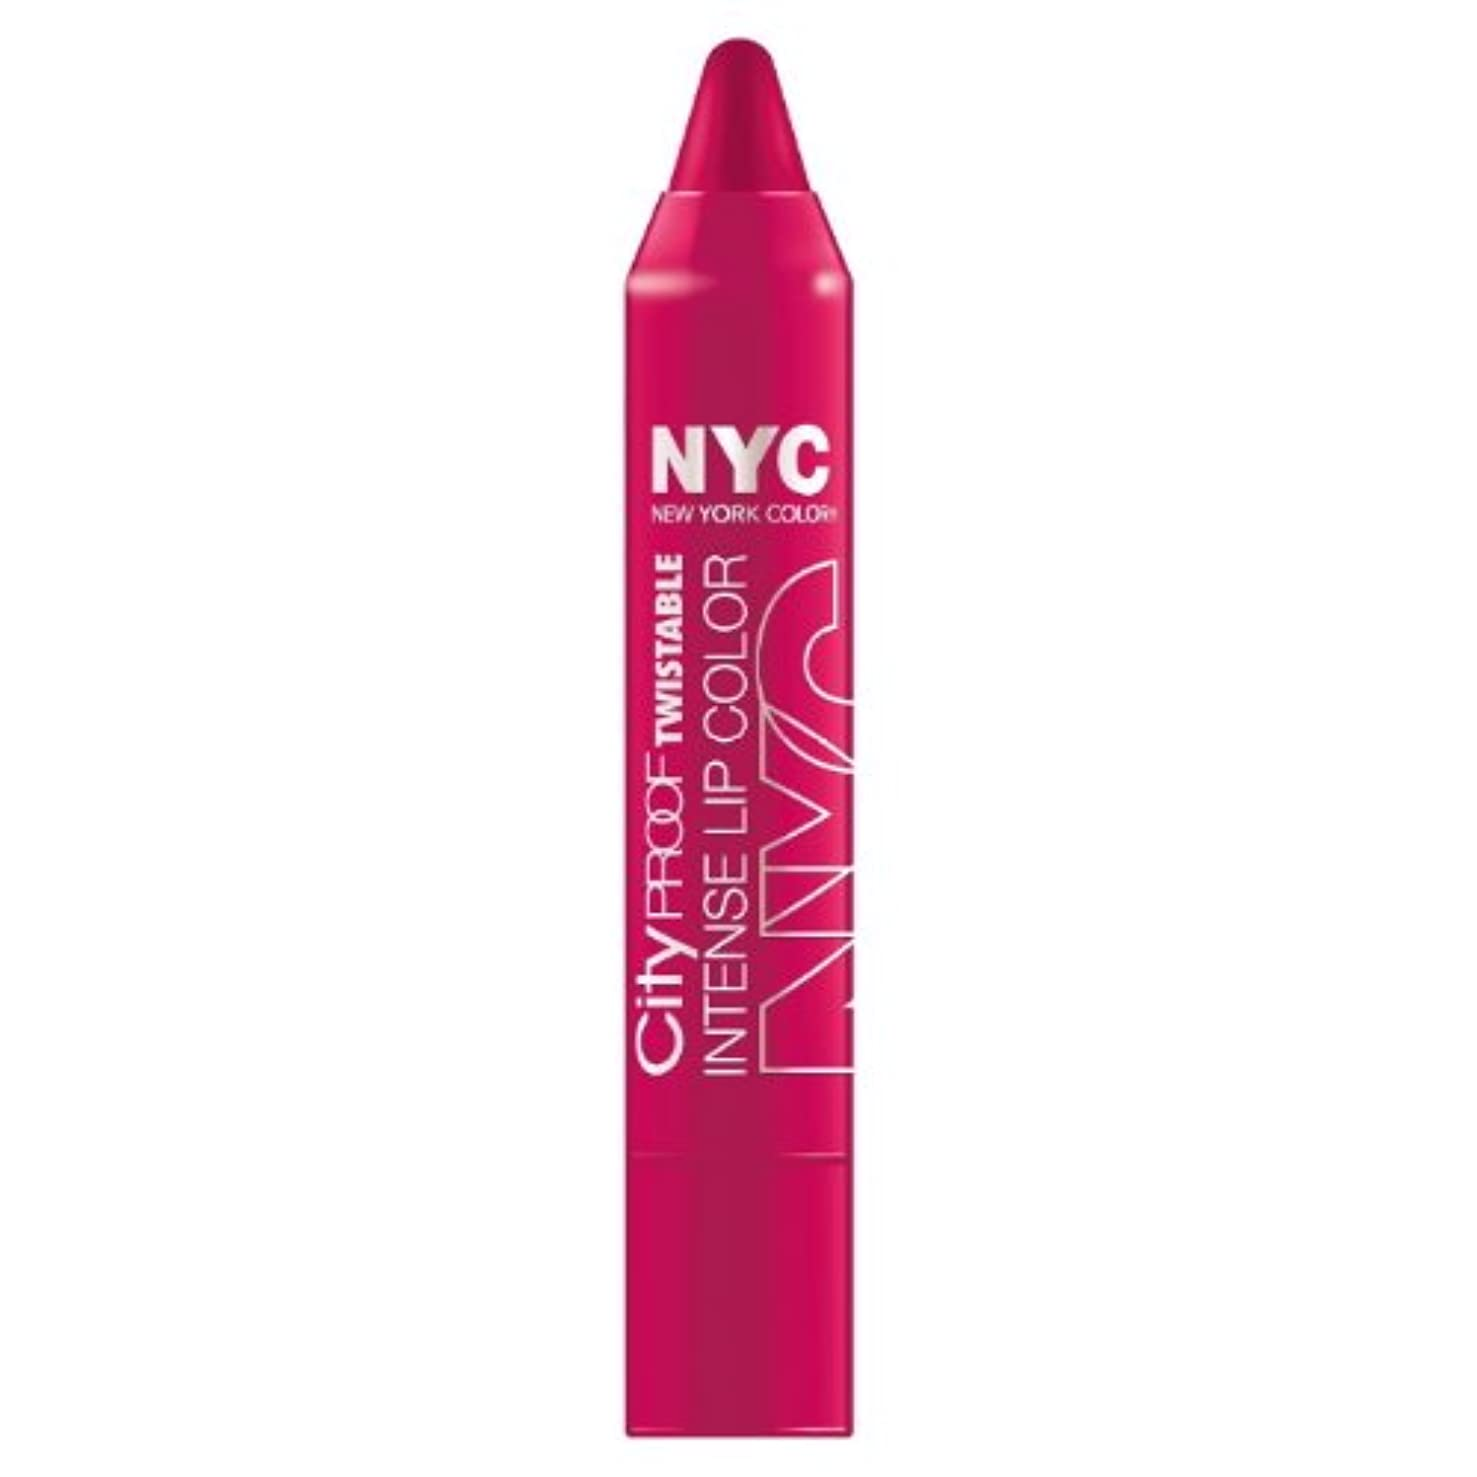 実業家返還小道(6 Pack) NYC City Proof Twistable Intense Lip Color - Ballroom Blush (並行輸入品)